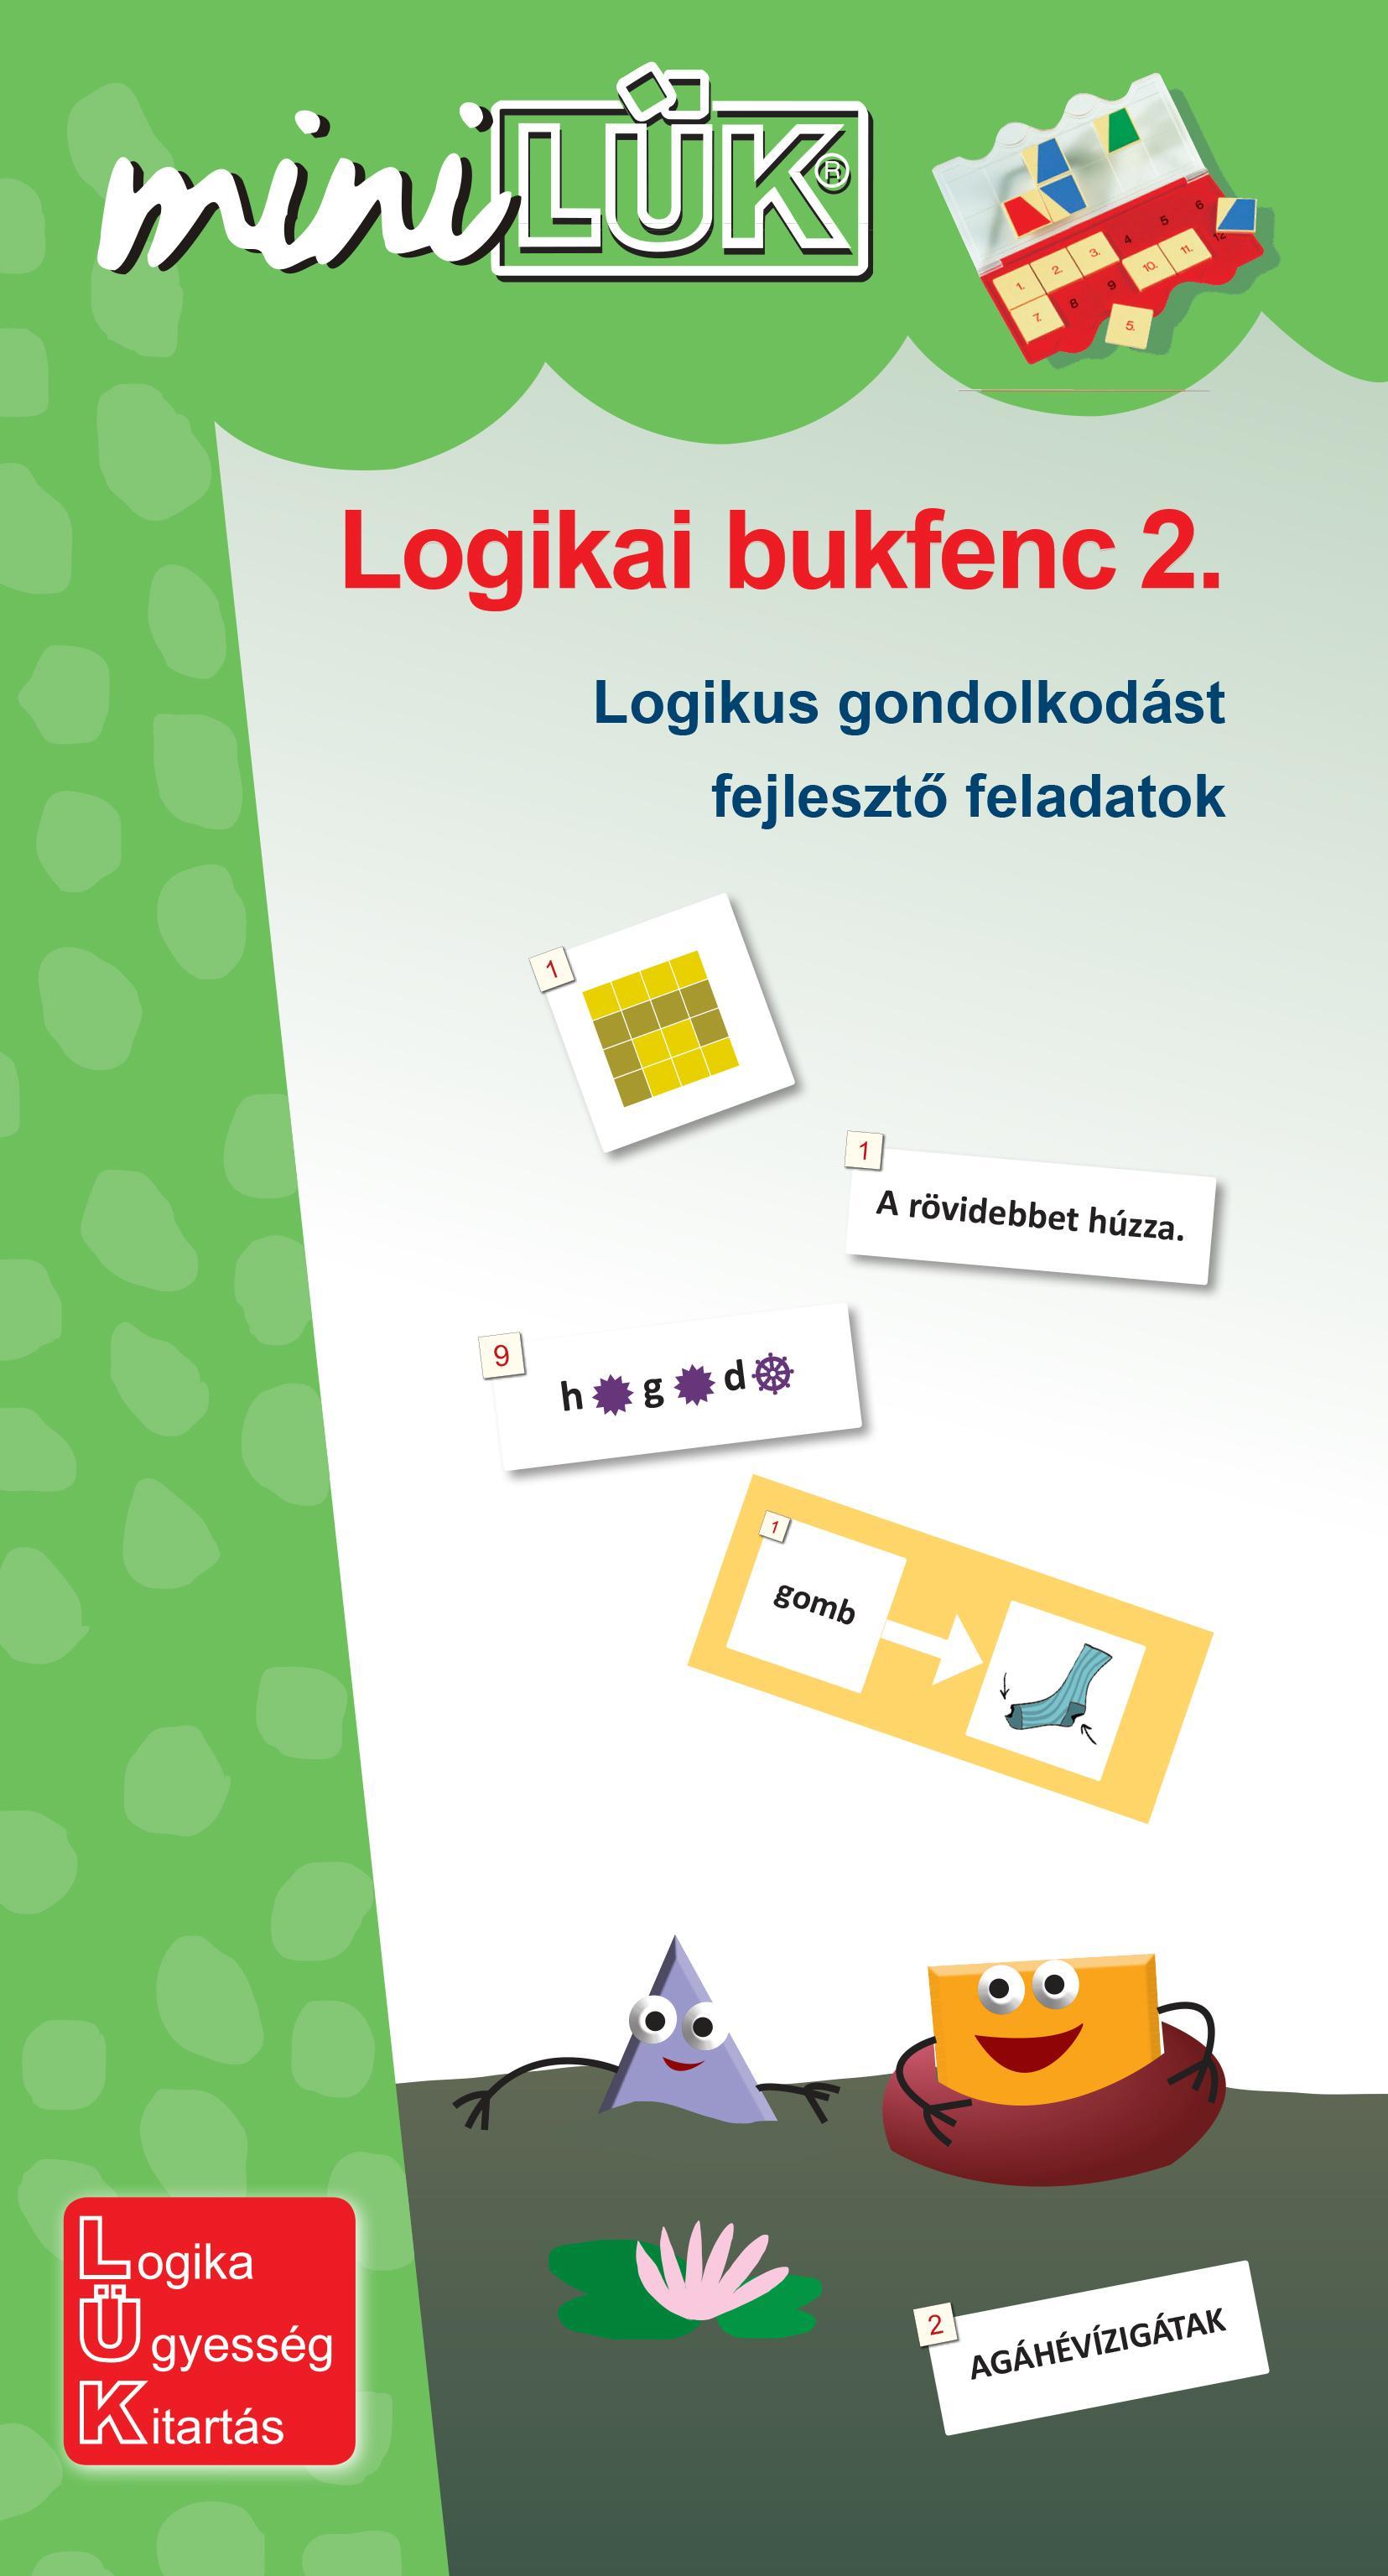 LOGIKAI BUKFENC 2. - LOGIKAI GONDOLKODÁST FEJLESZTŐ FELADATOK